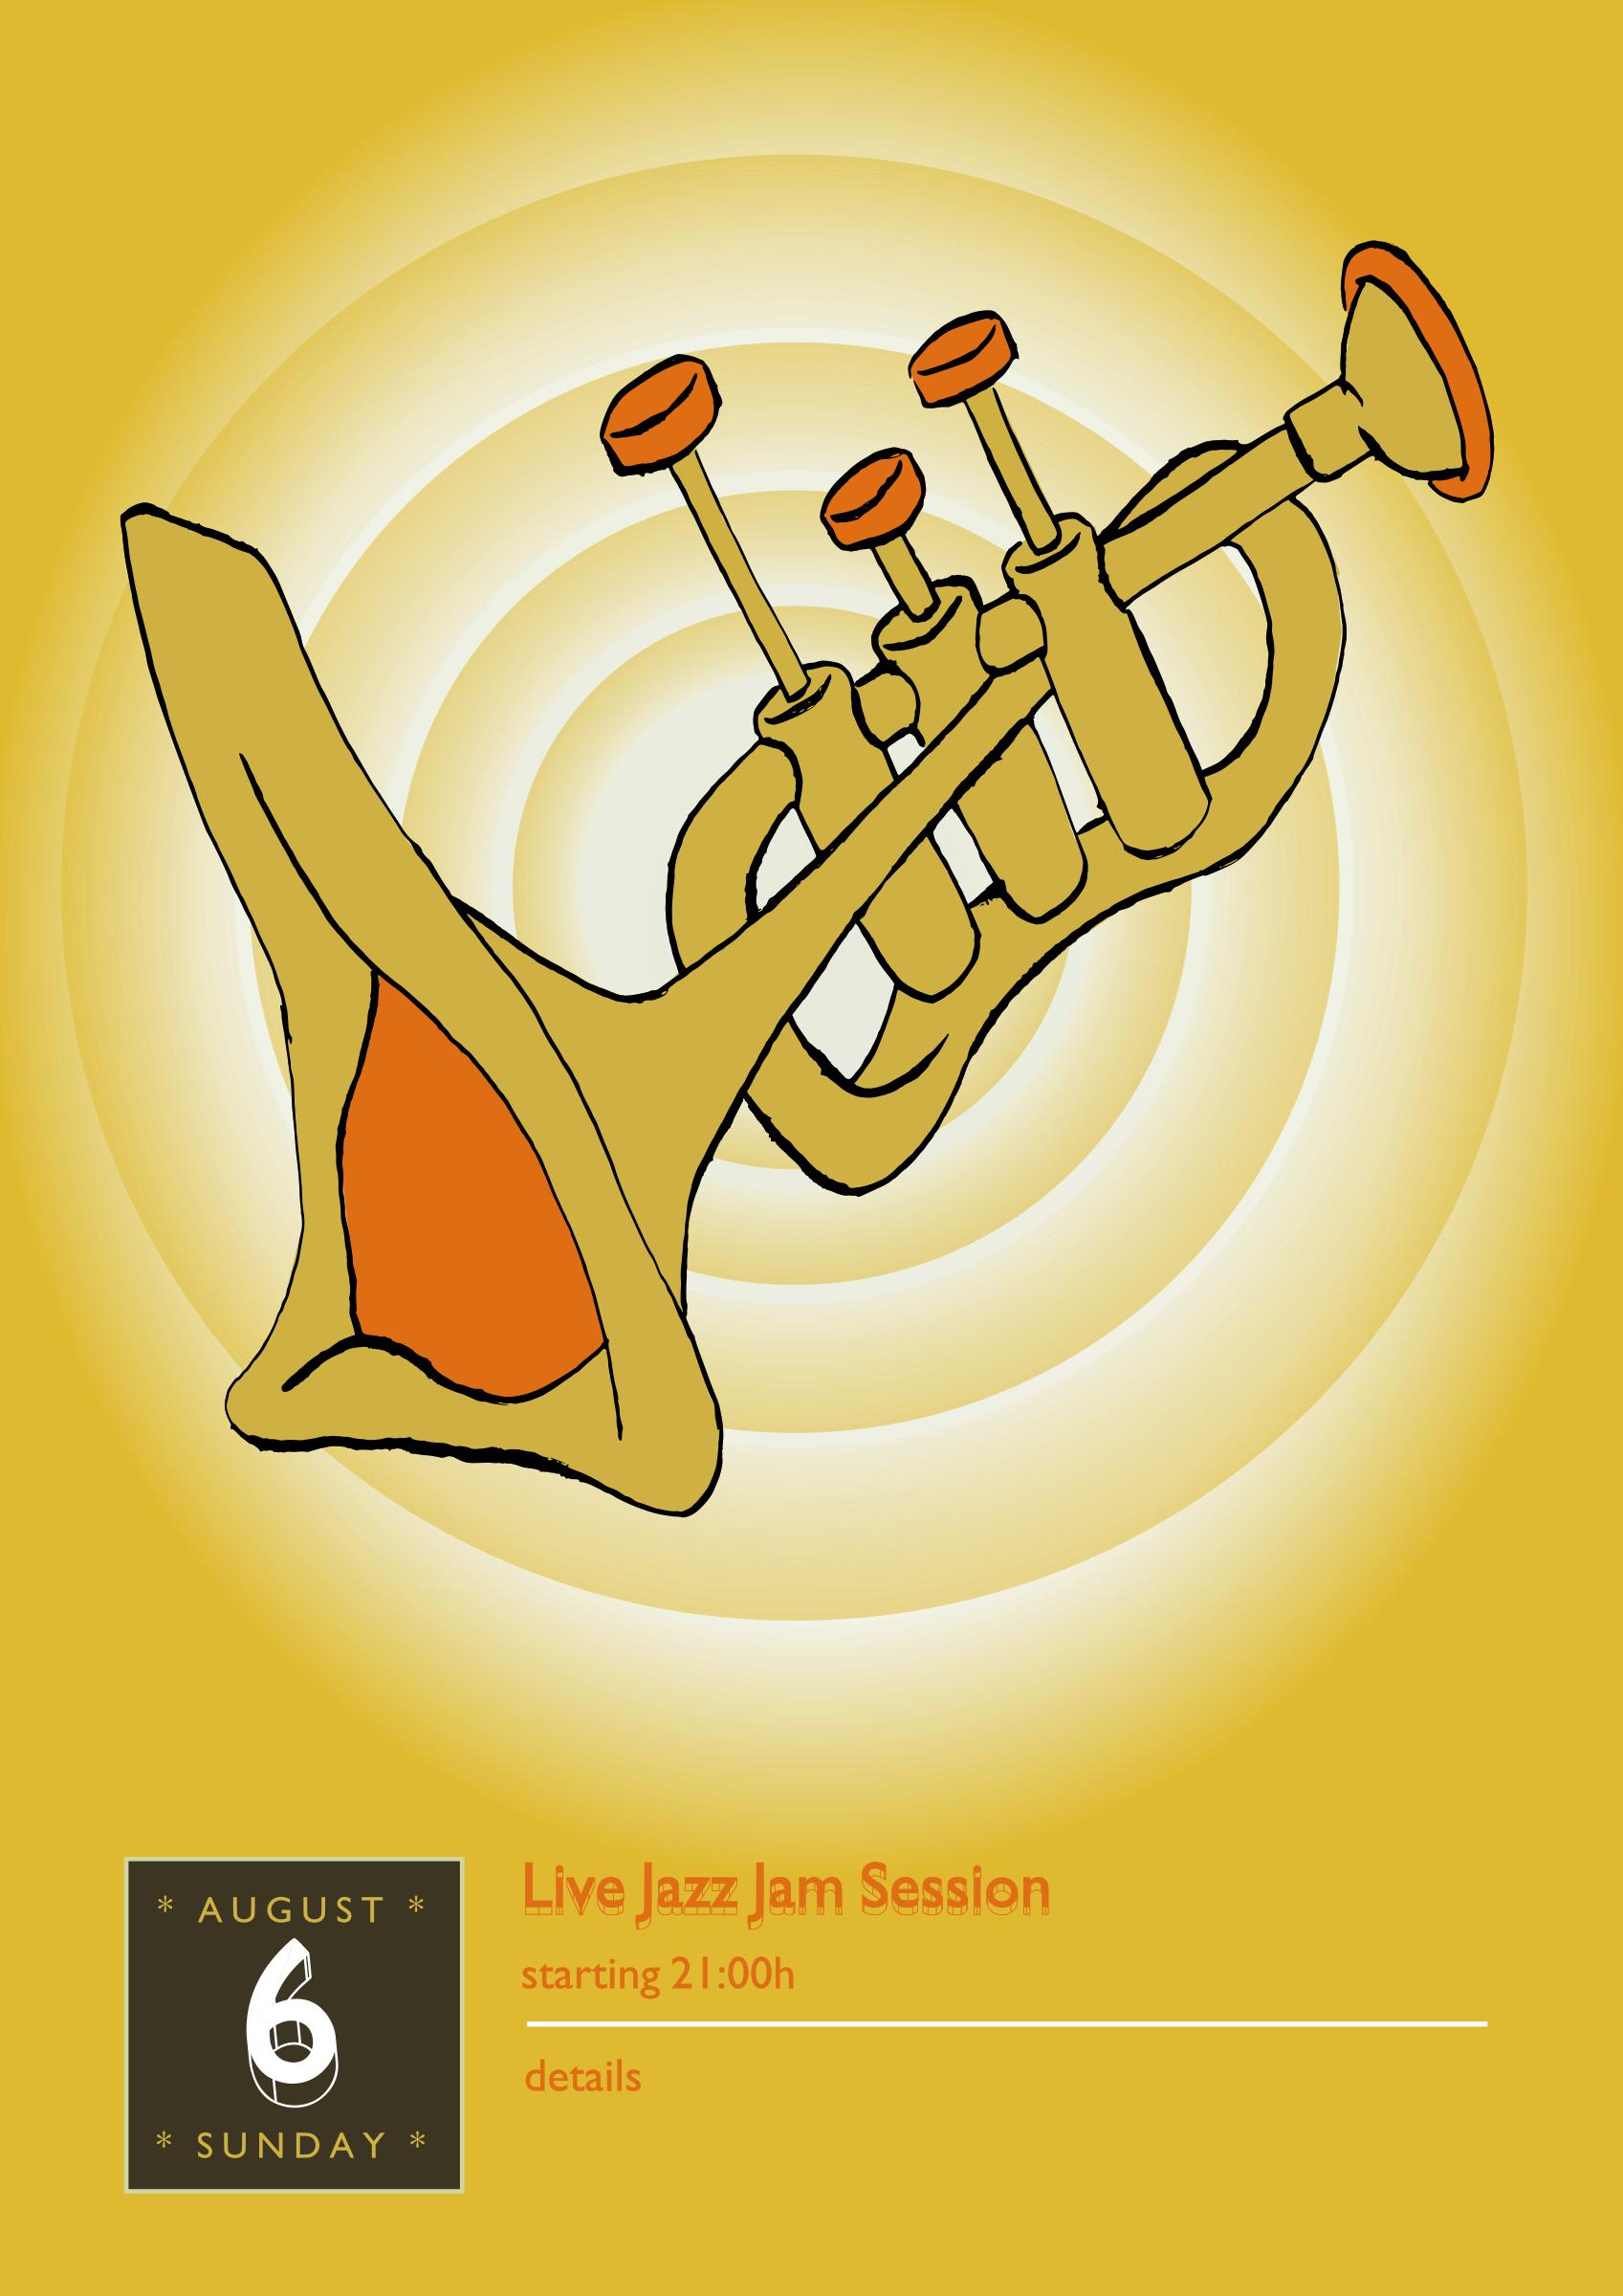 Big image png. Musician clipart jazz trumpet